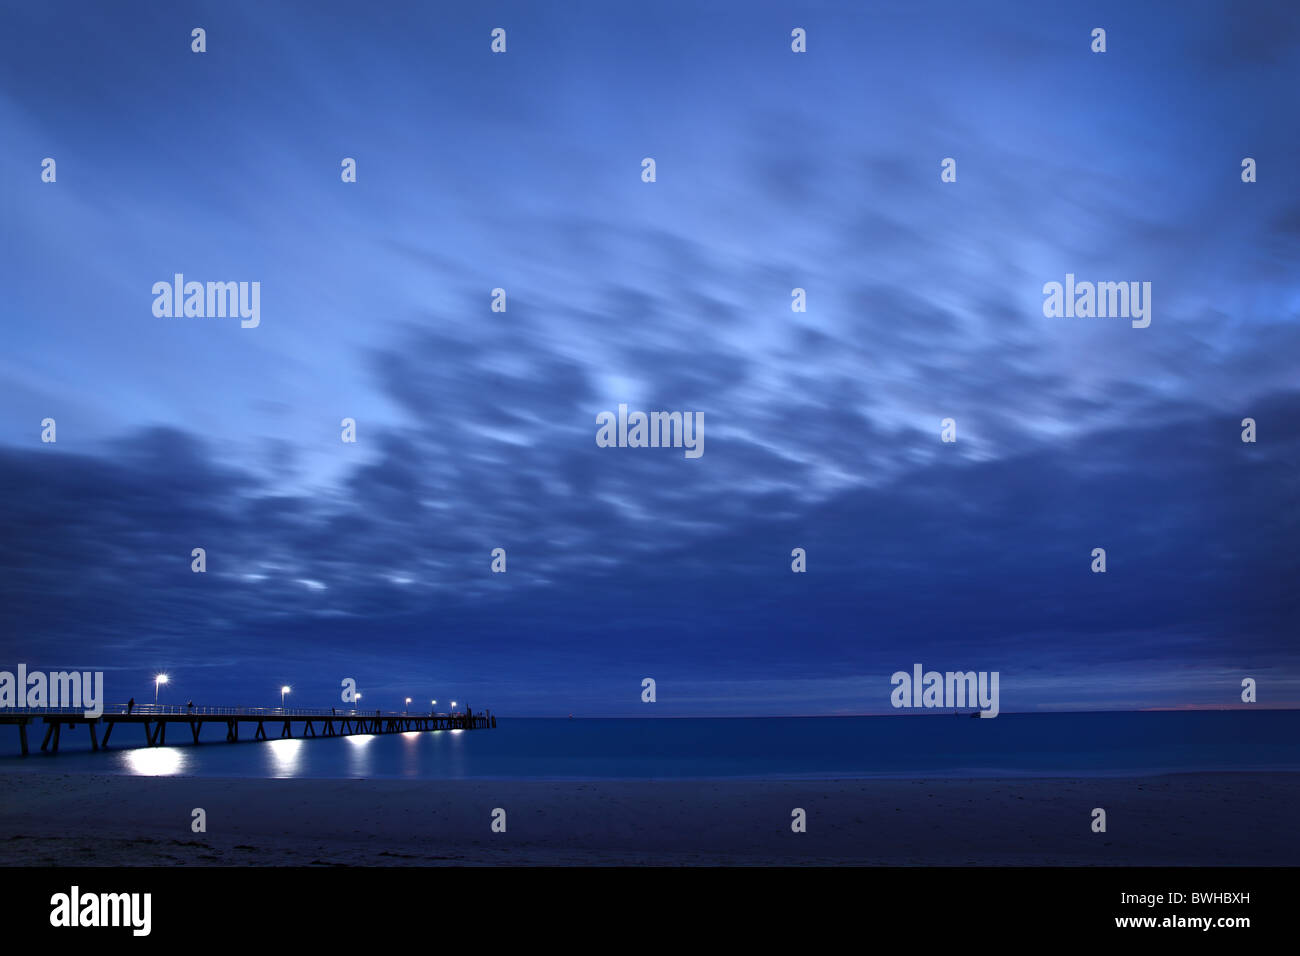 Sunset at Glenelg, South Australia - Stock Image